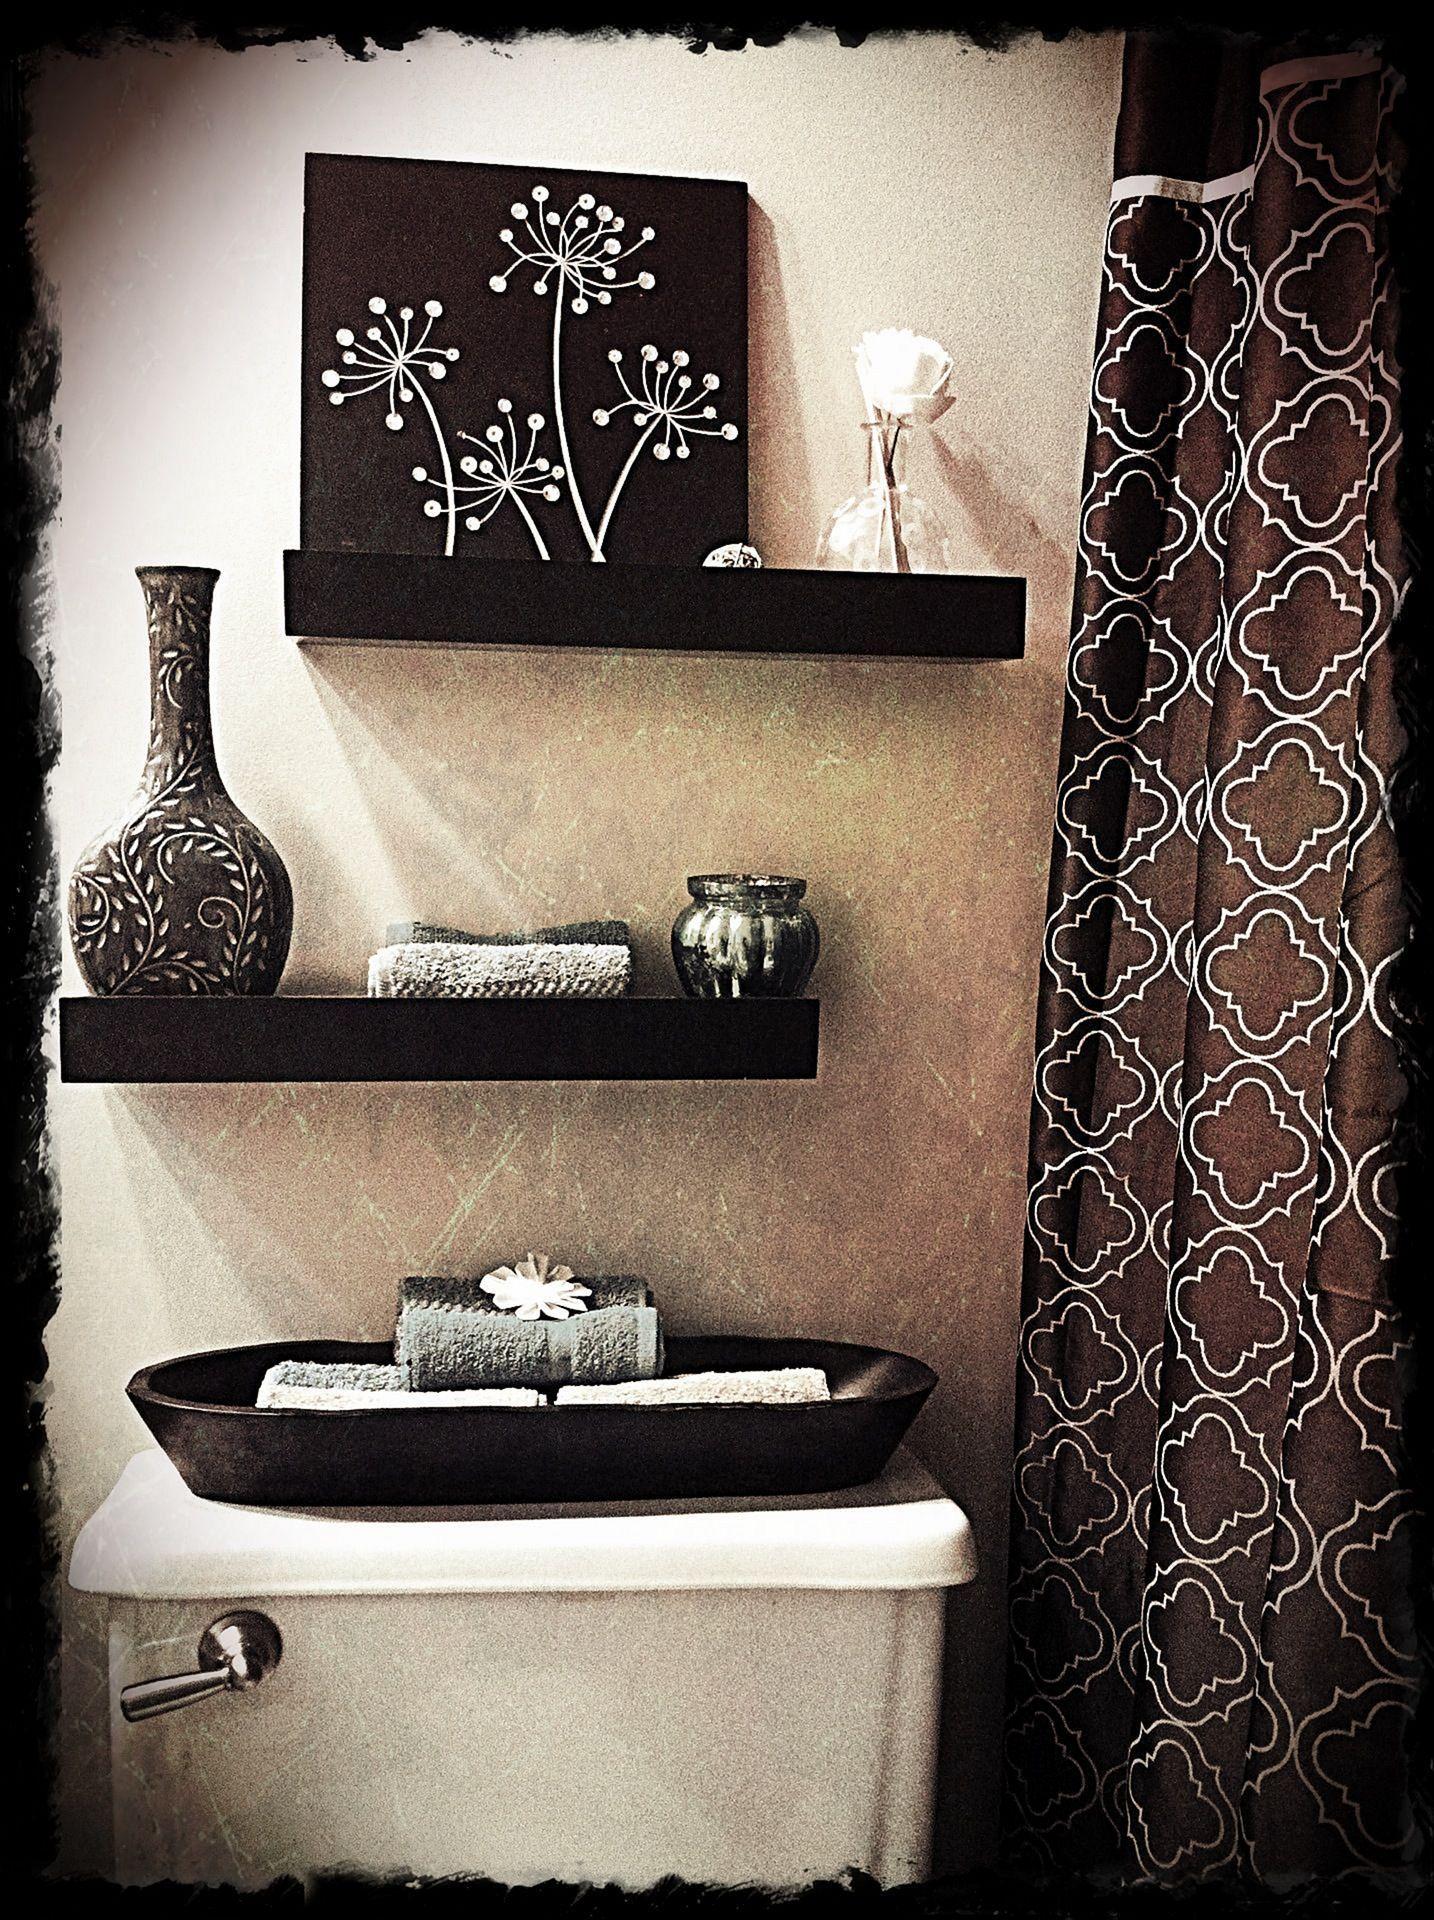 Inspiring 30 awesome bathroom decorative wall design for modern your bathroom https hroomy